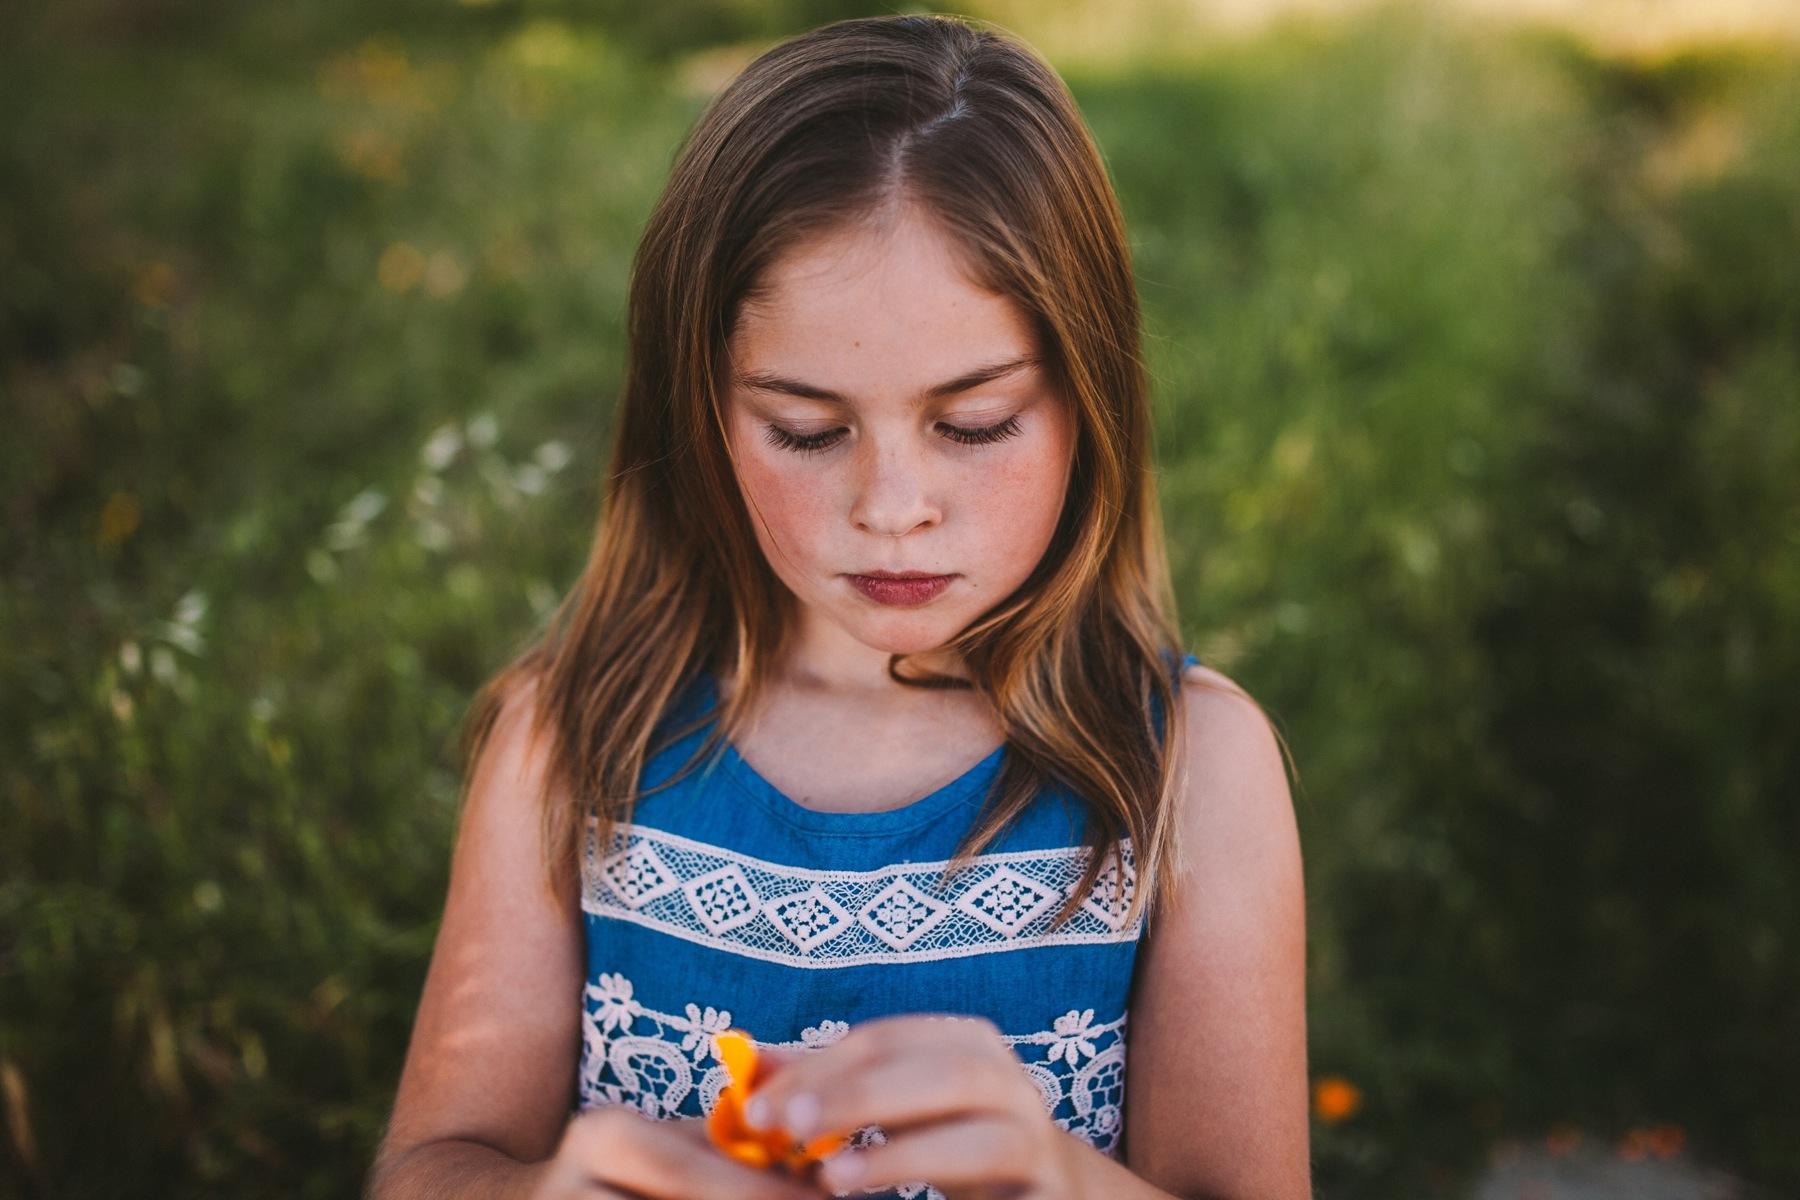 Sonora Tuolumne County Kids Family Photography Shoot 10.jpg